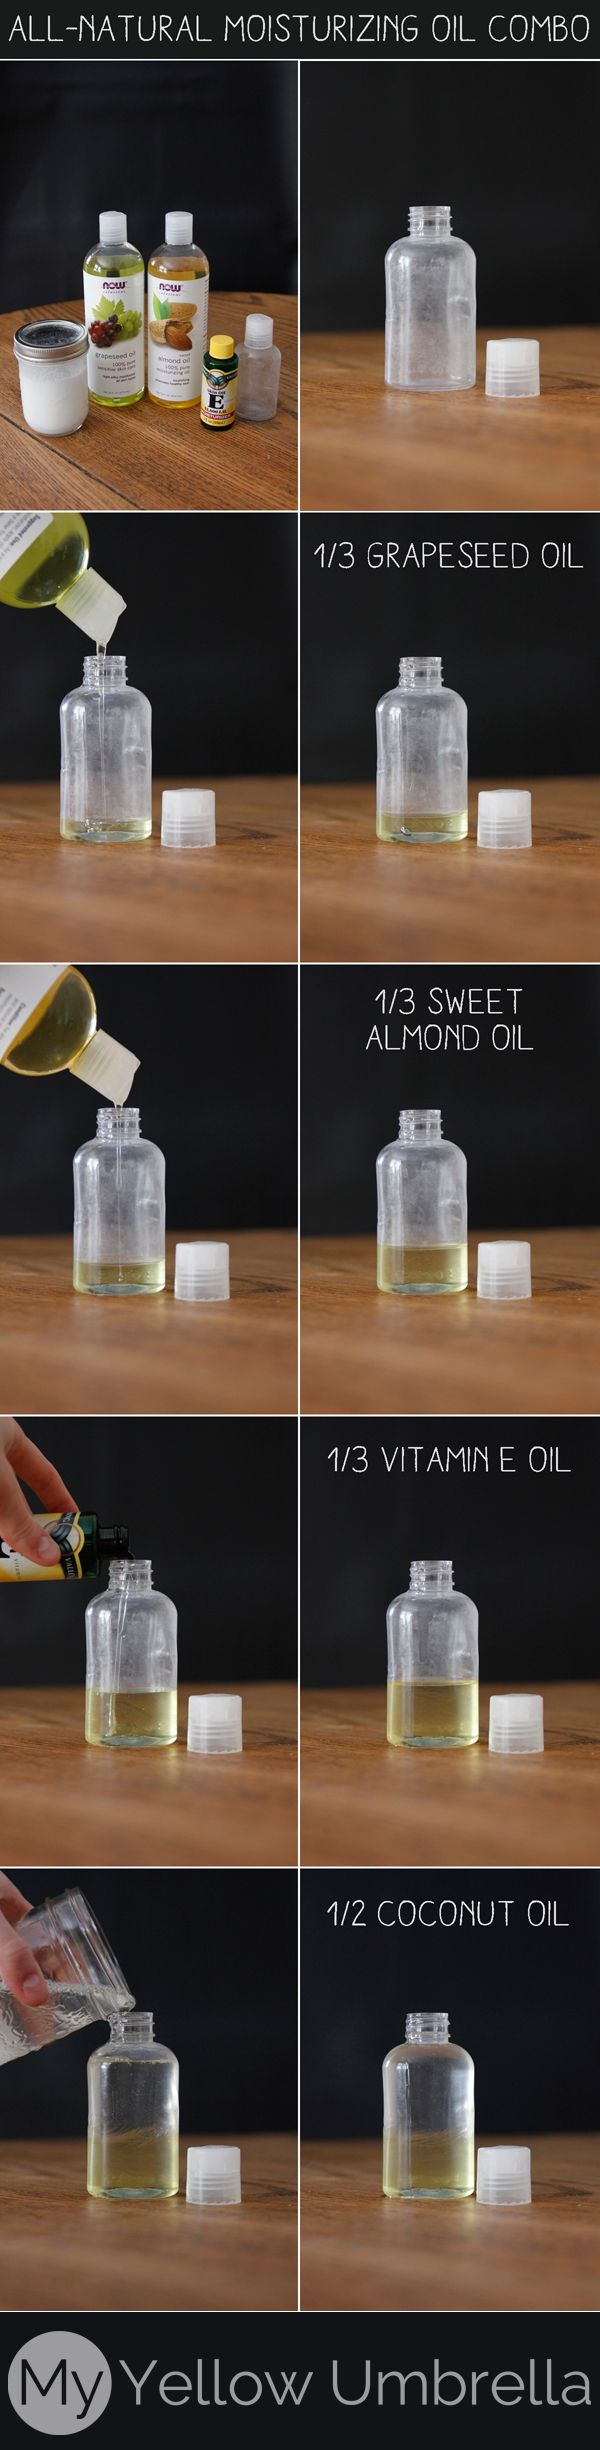 all natural oil moisturizer recipe...add some castor oil